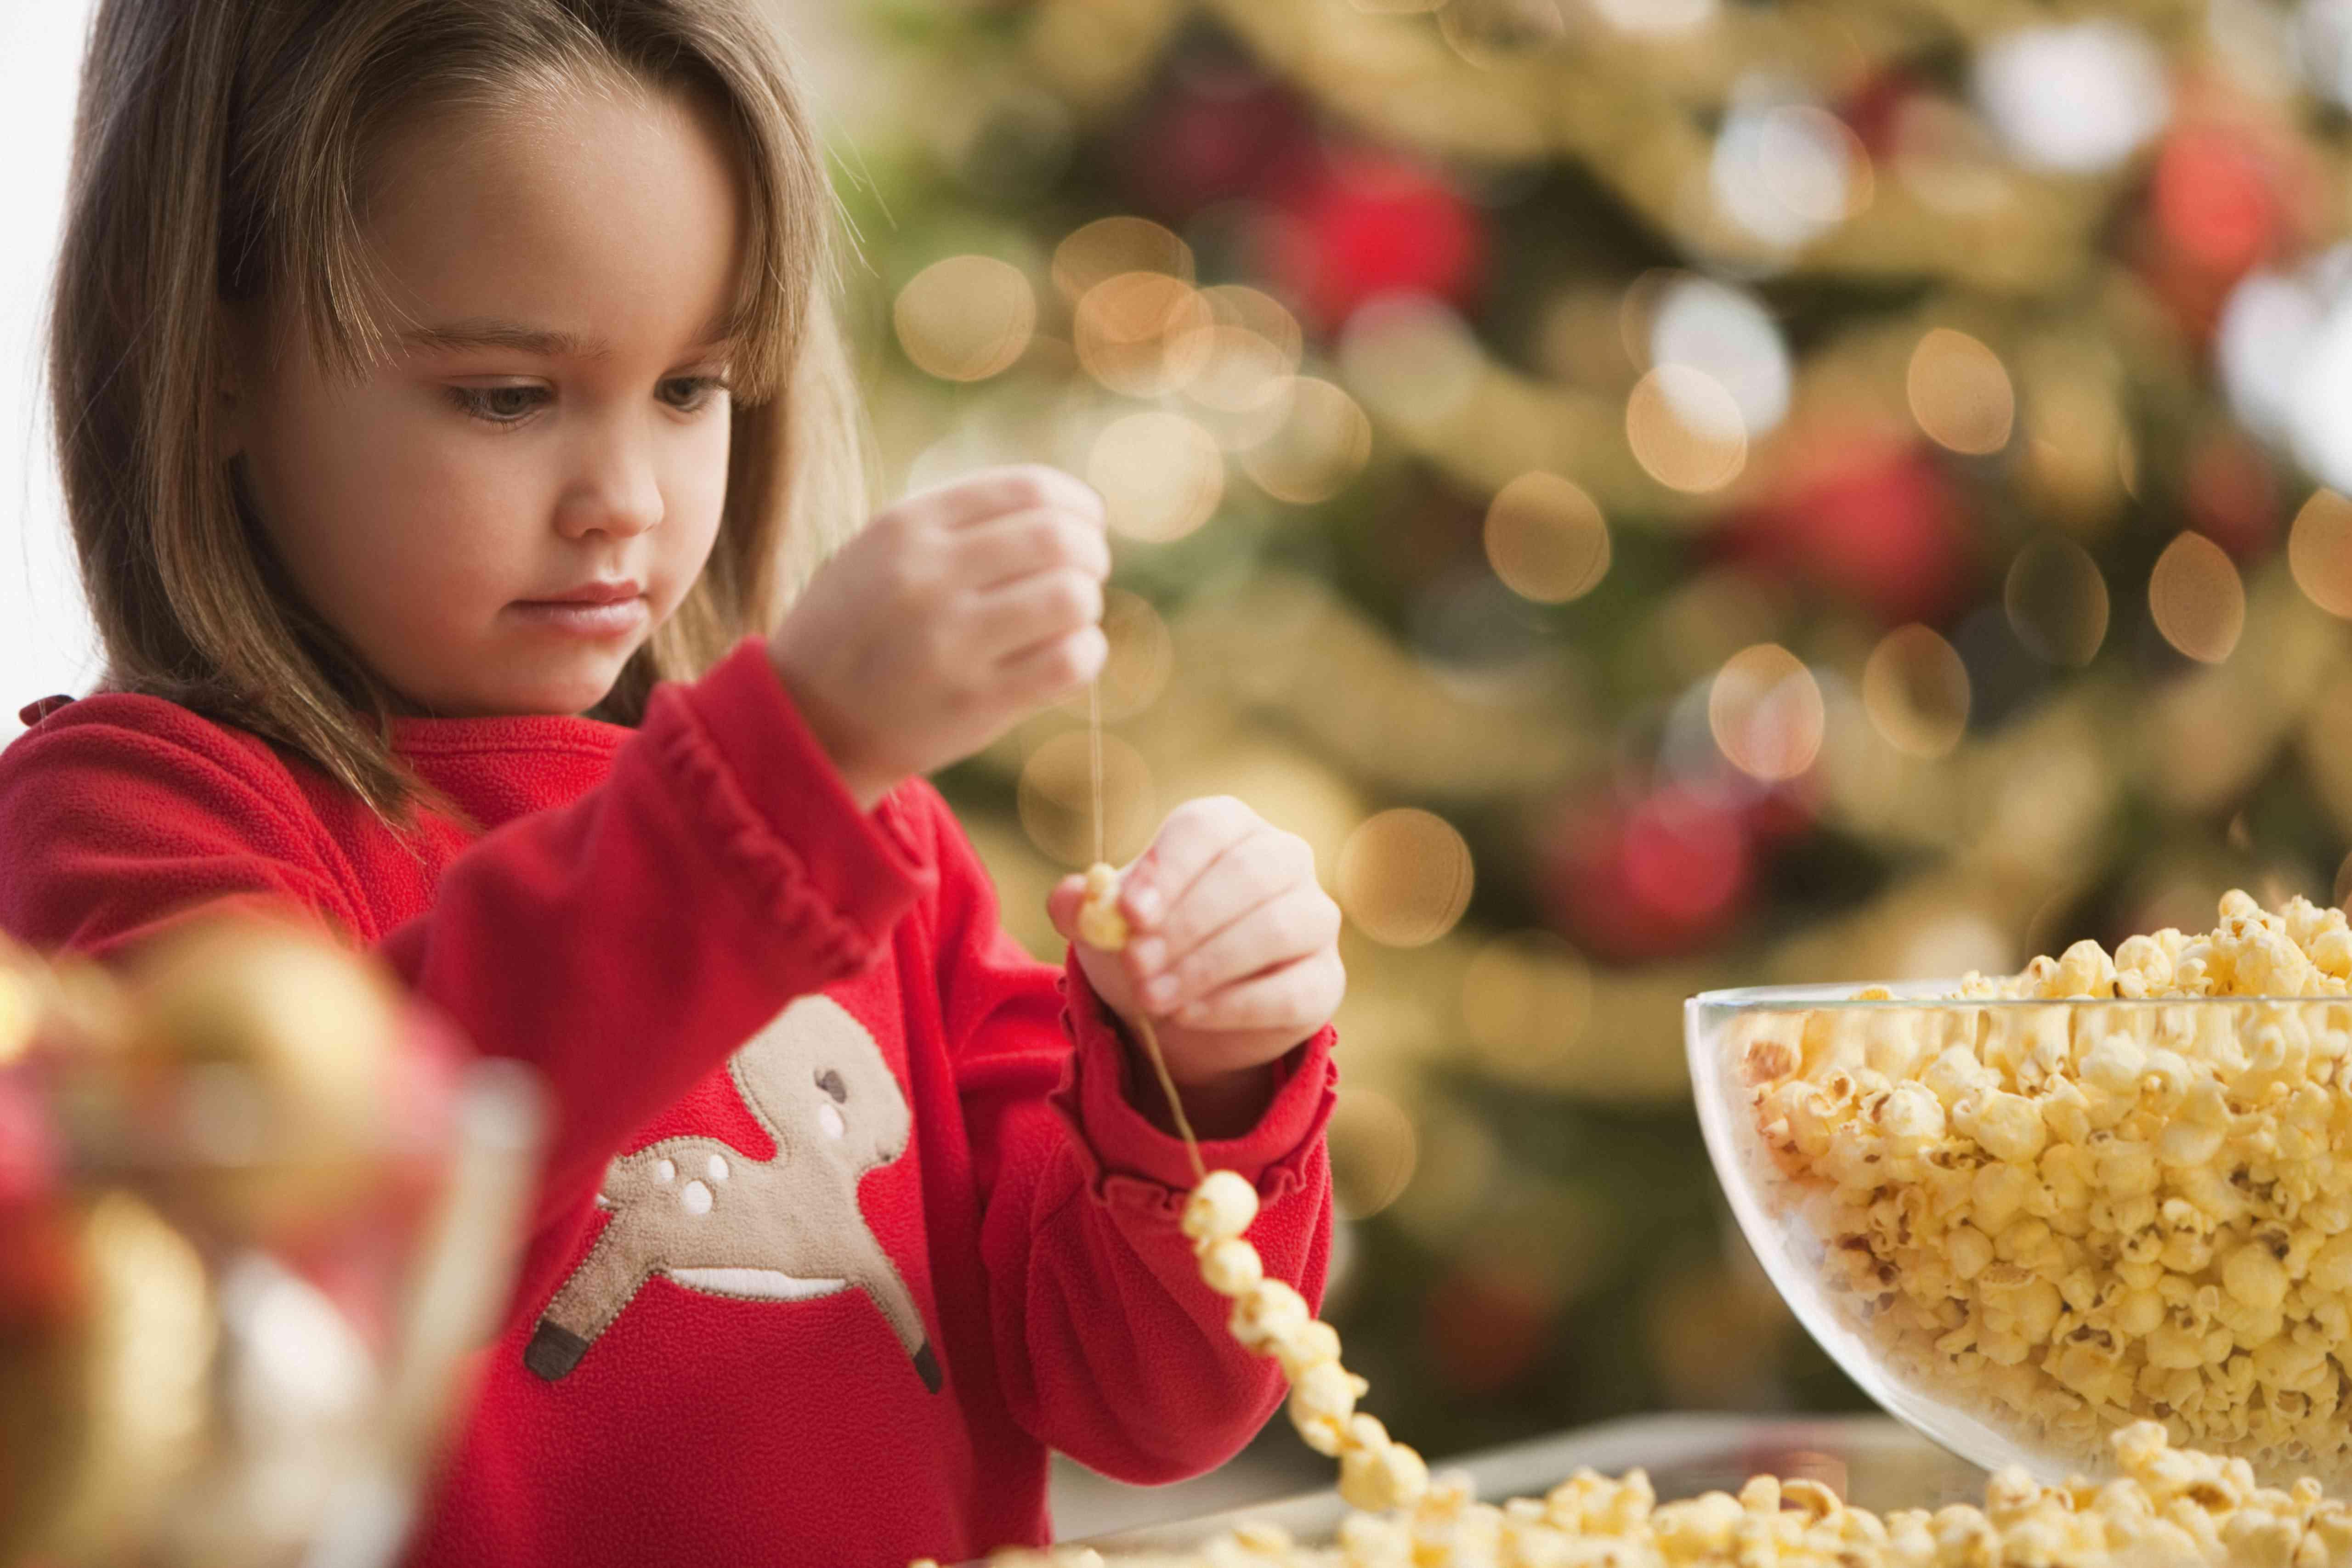 Young girl stringing popcorn at Christmastime